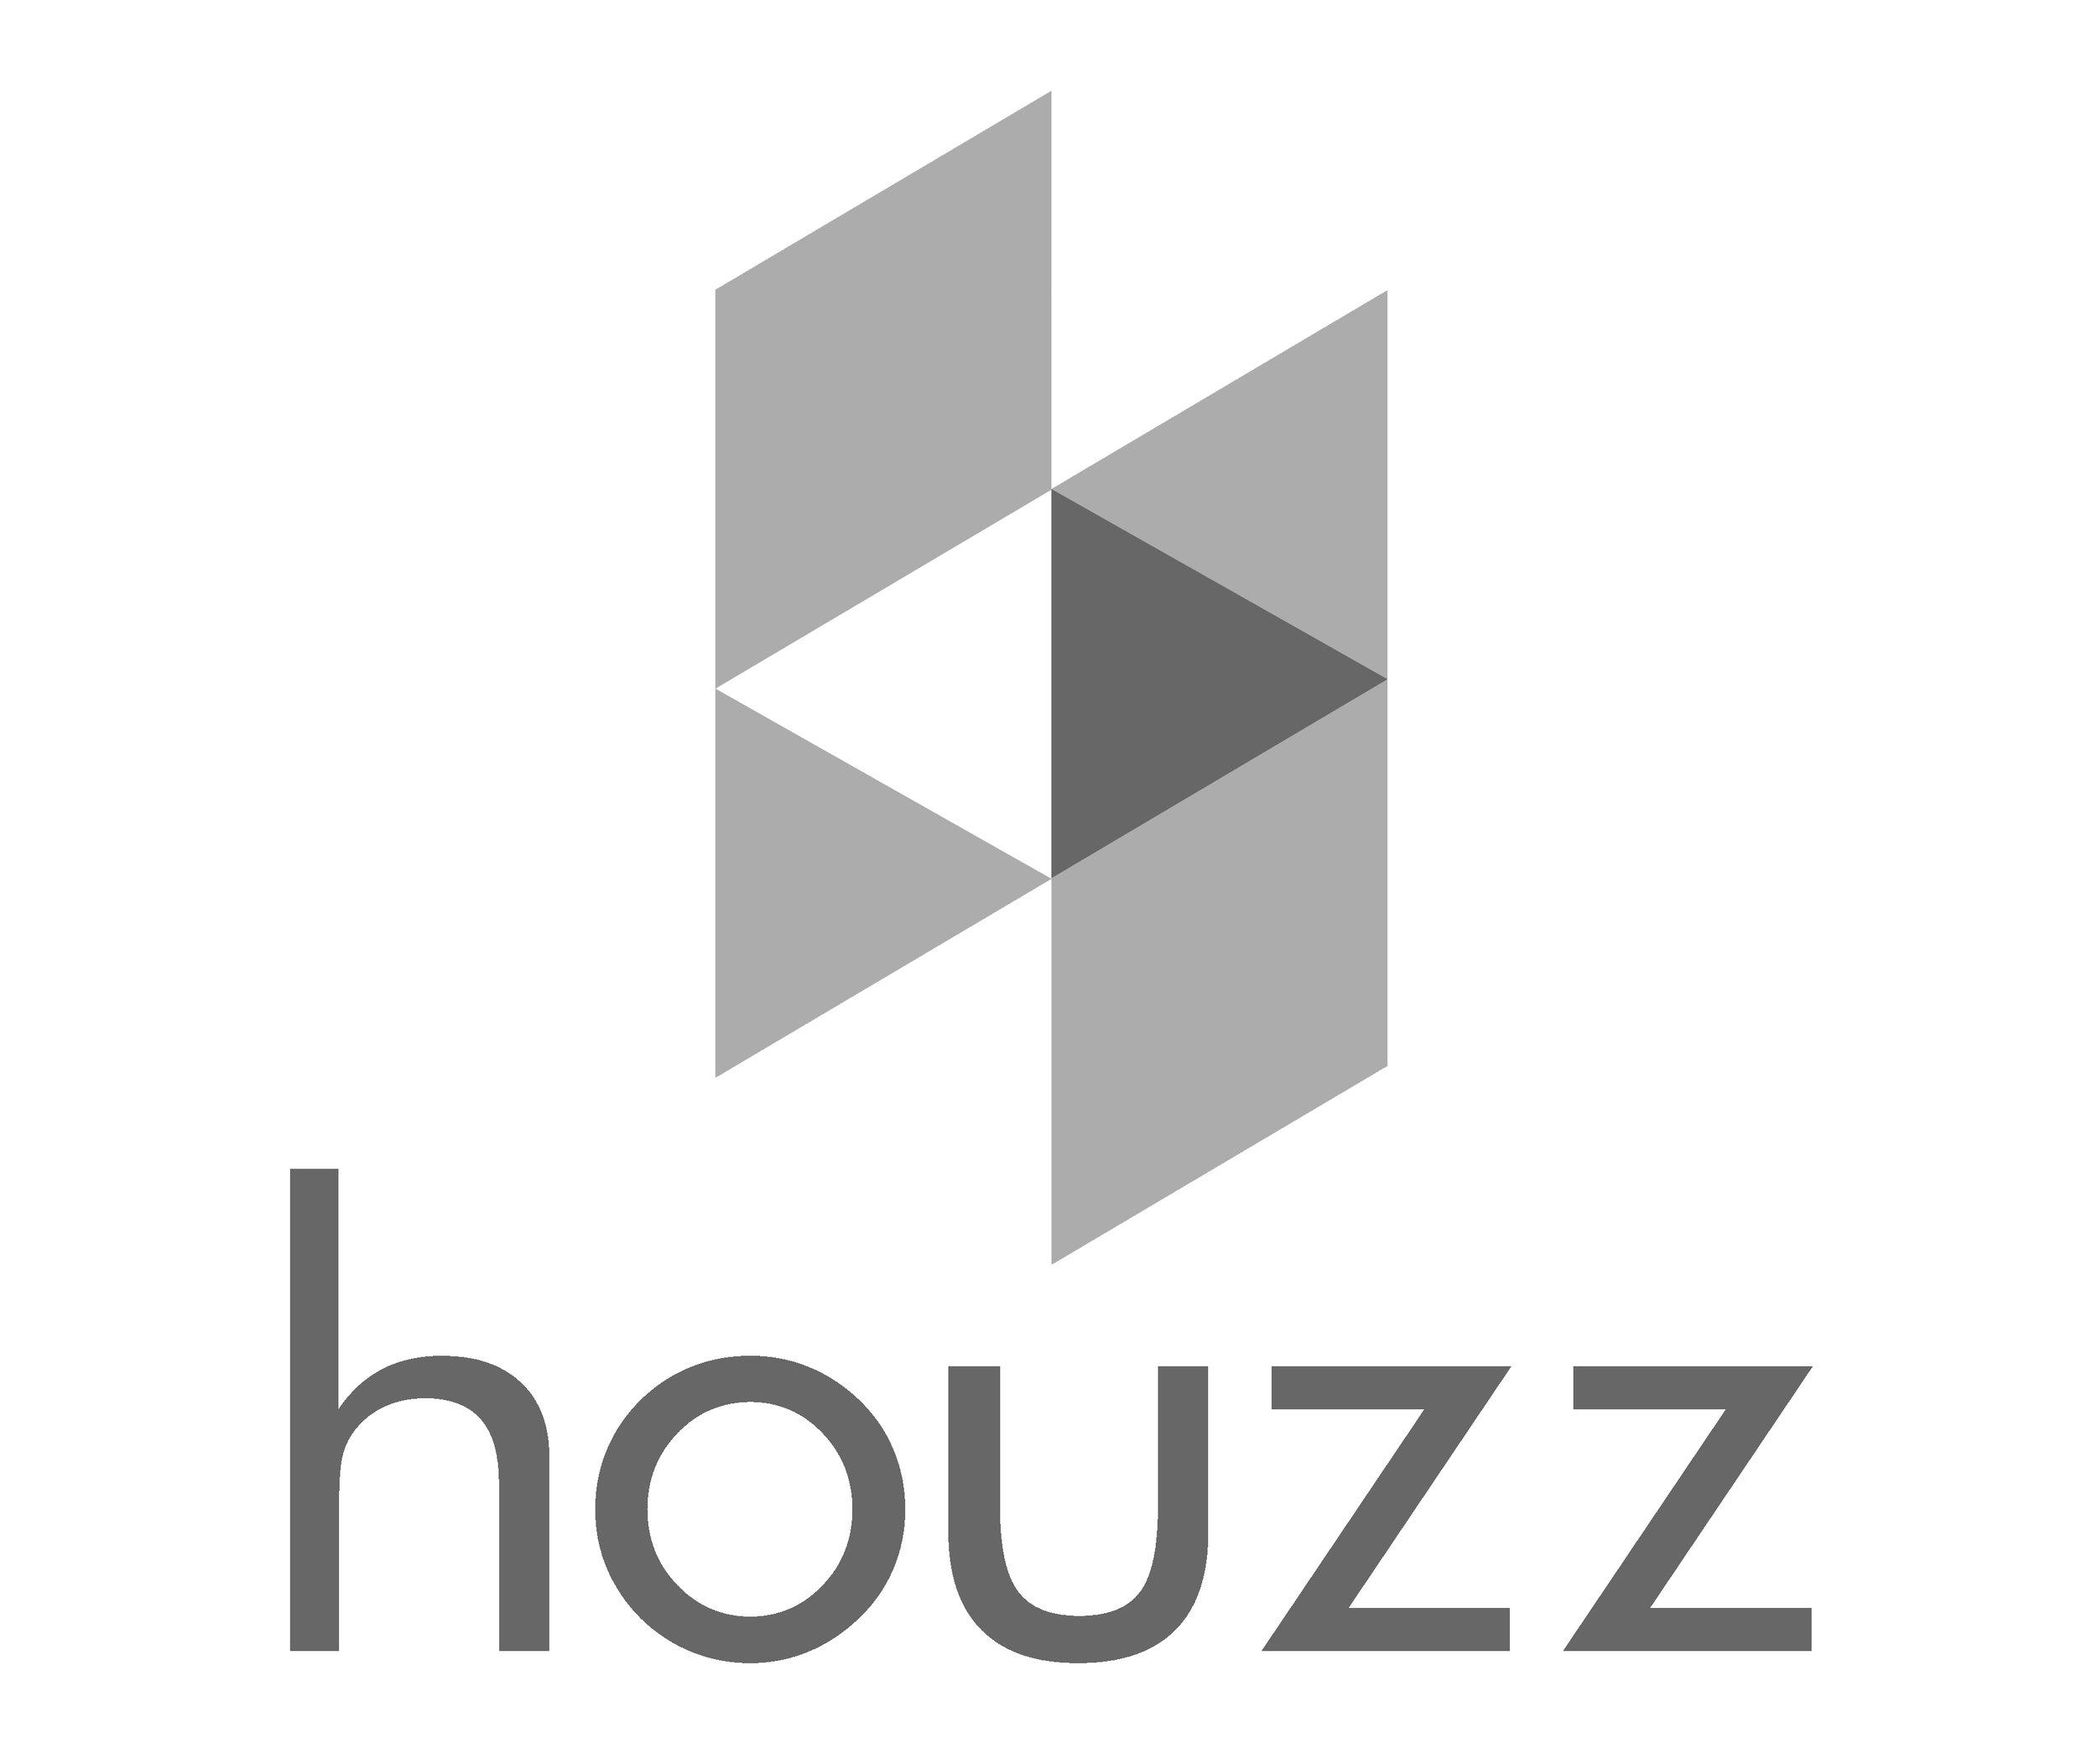 Houzz-emblem copy.jpg